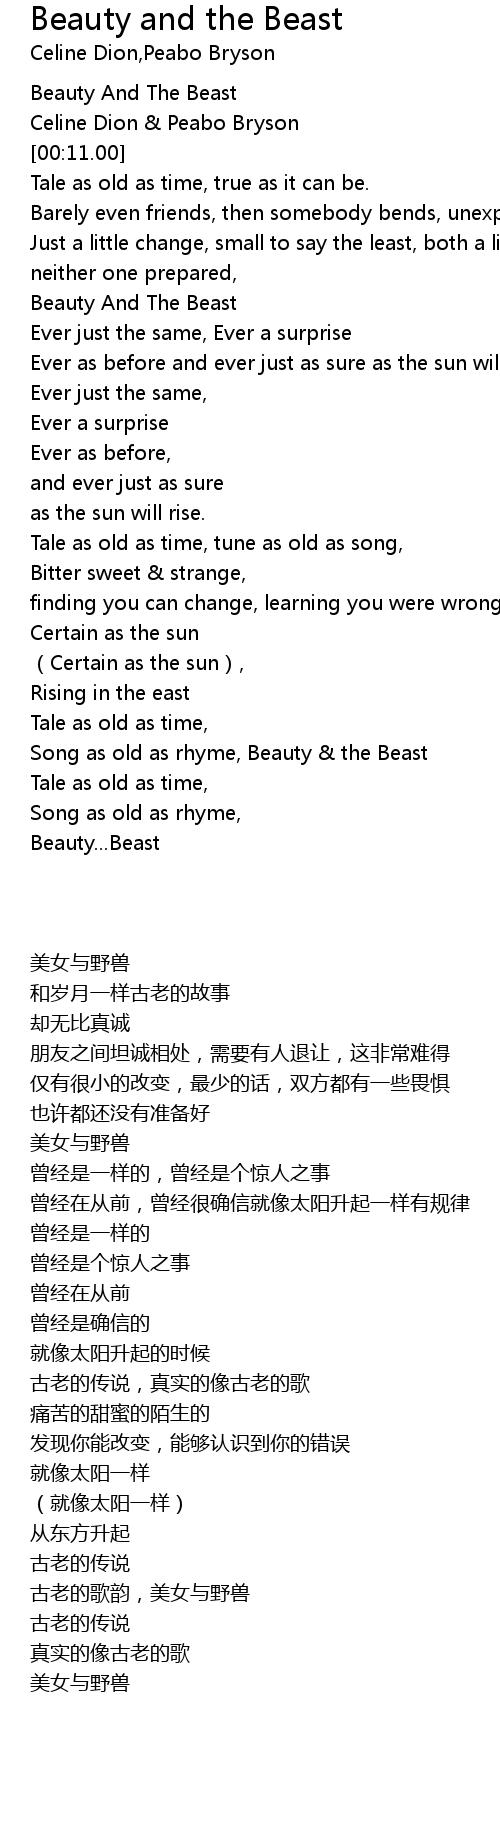 Beauty And The Beast Lyrics Follow Lyrics